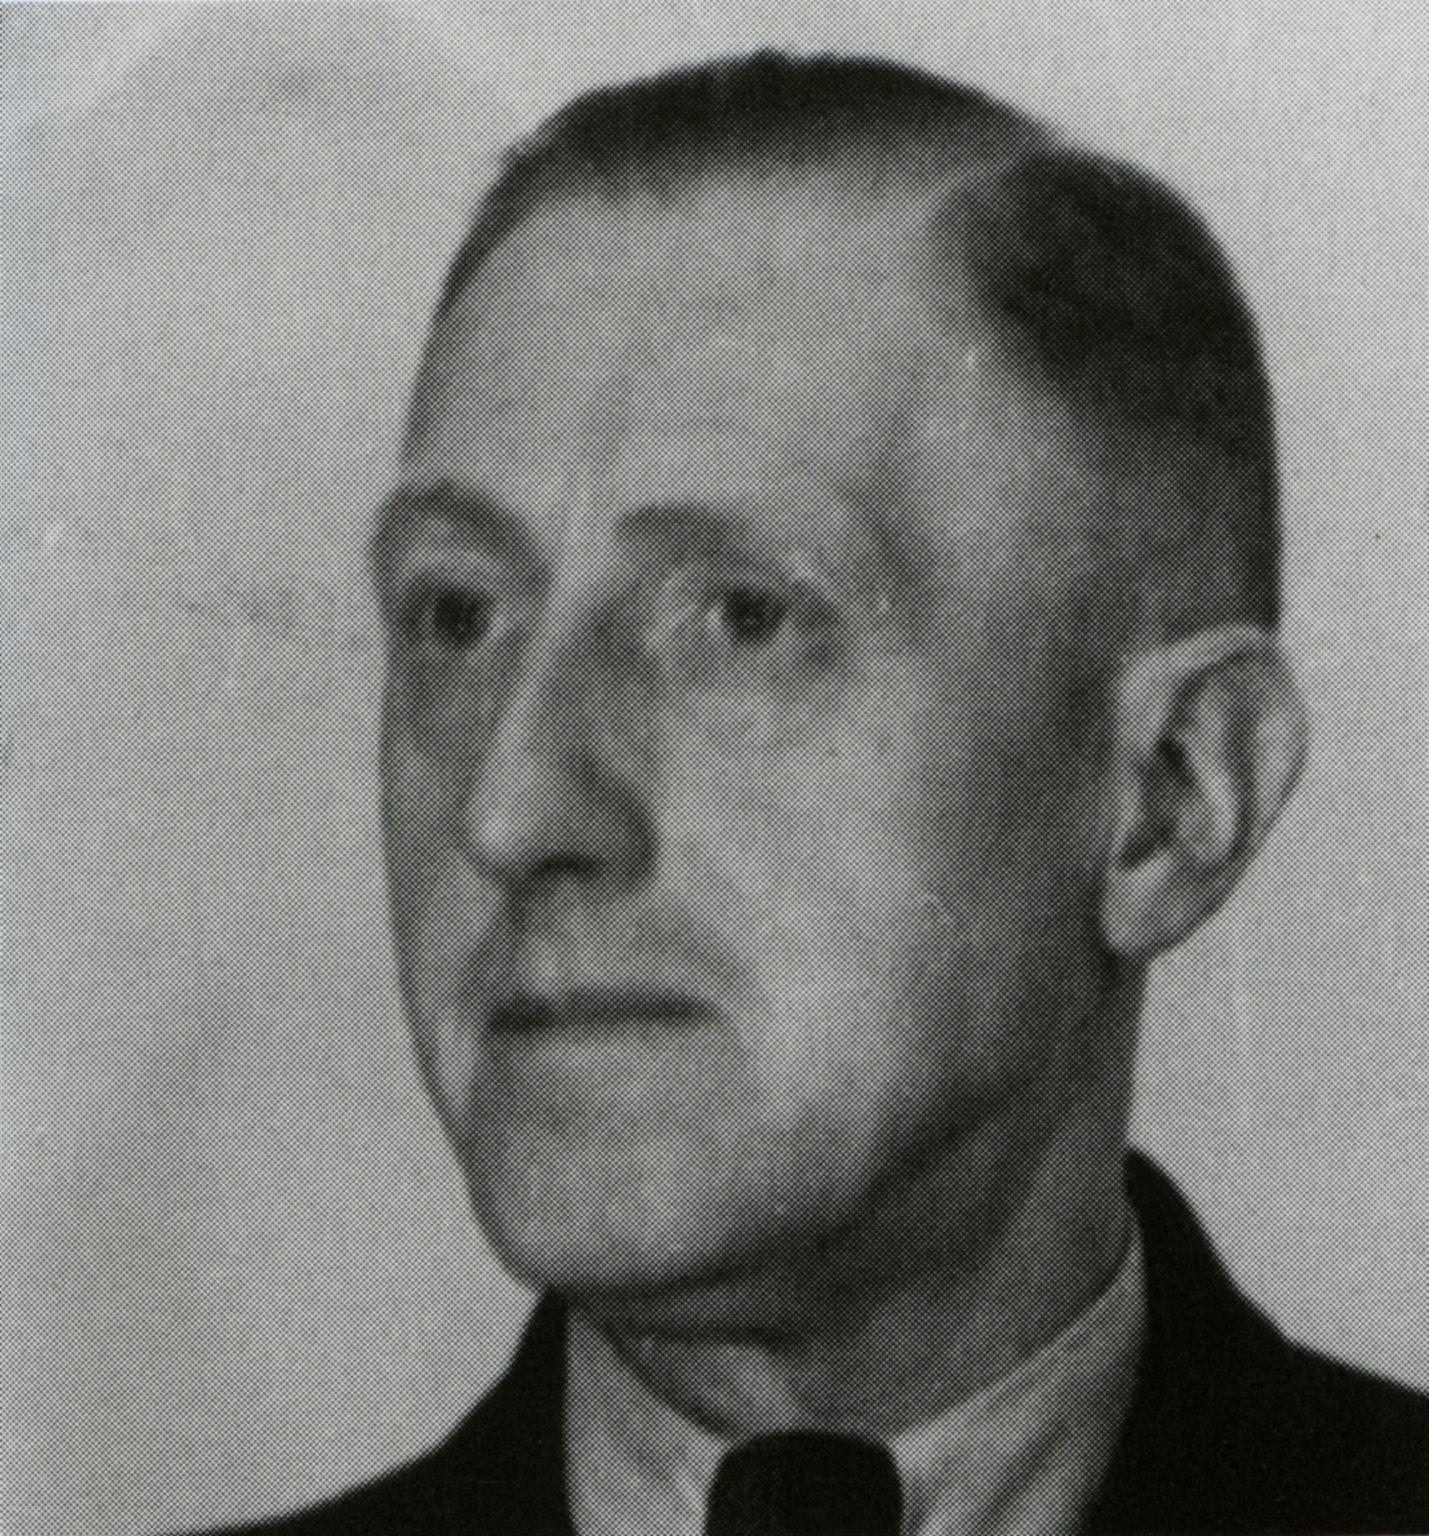 Willem Grootendorst